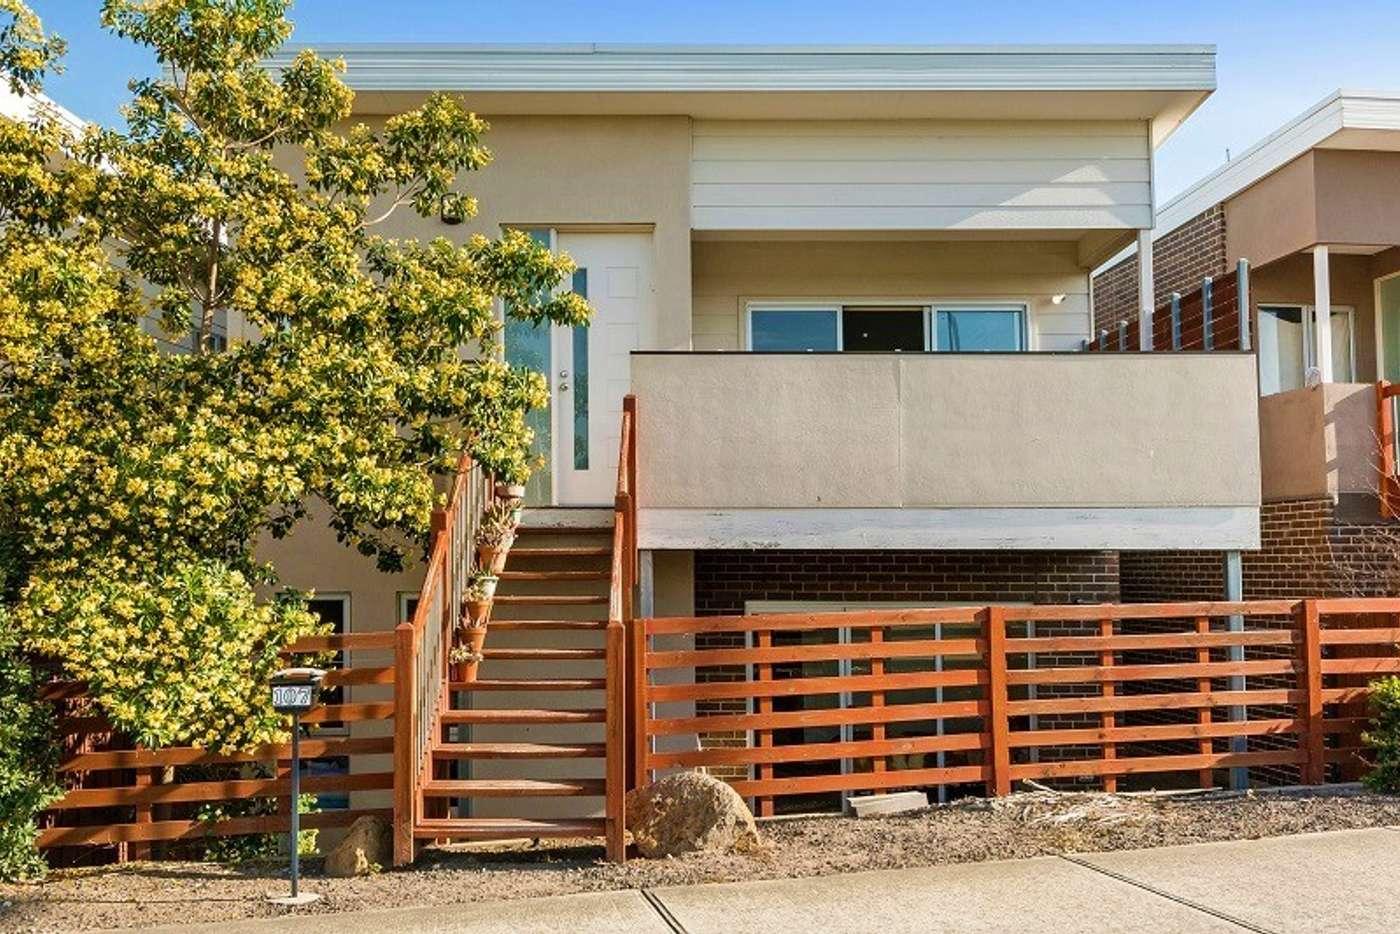 Main view of Homely house listing, 107 Creekwood Drive, Craigieburn VIC 3064